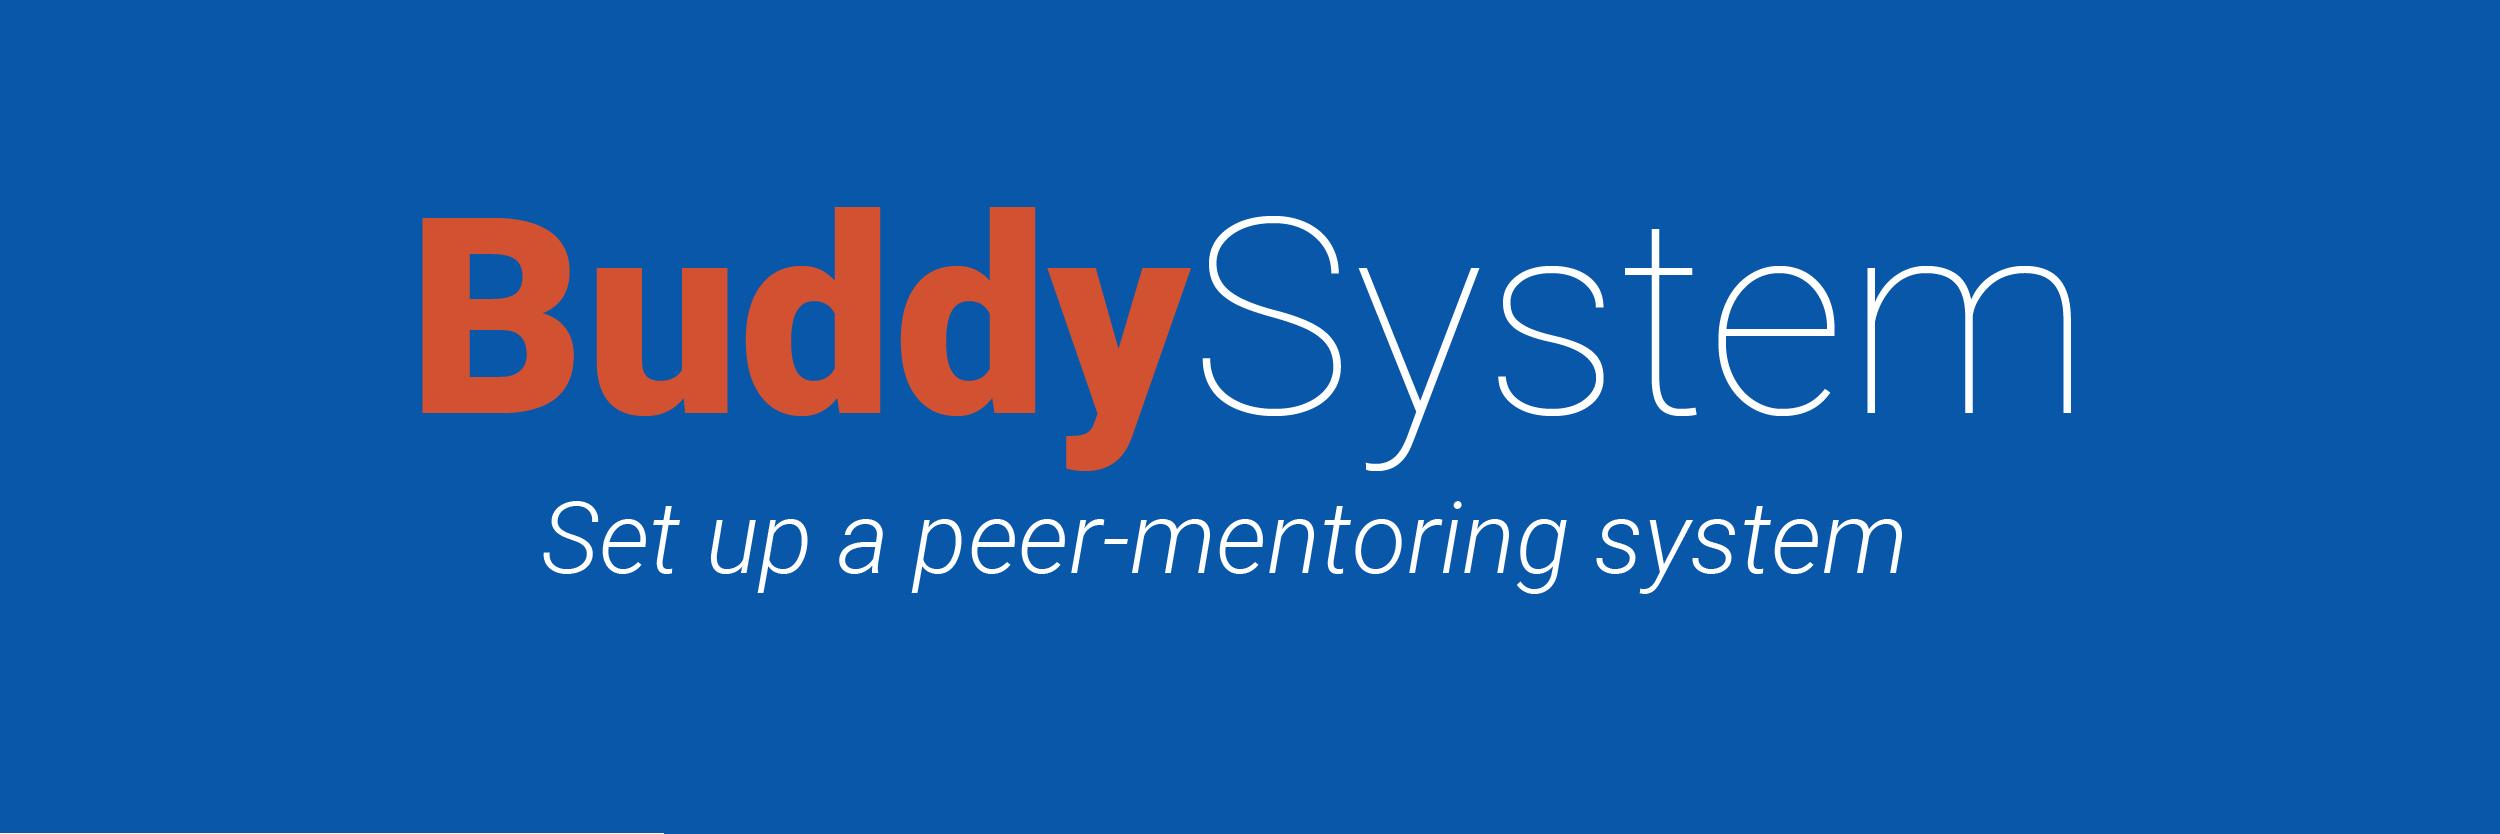 Buddy System-01